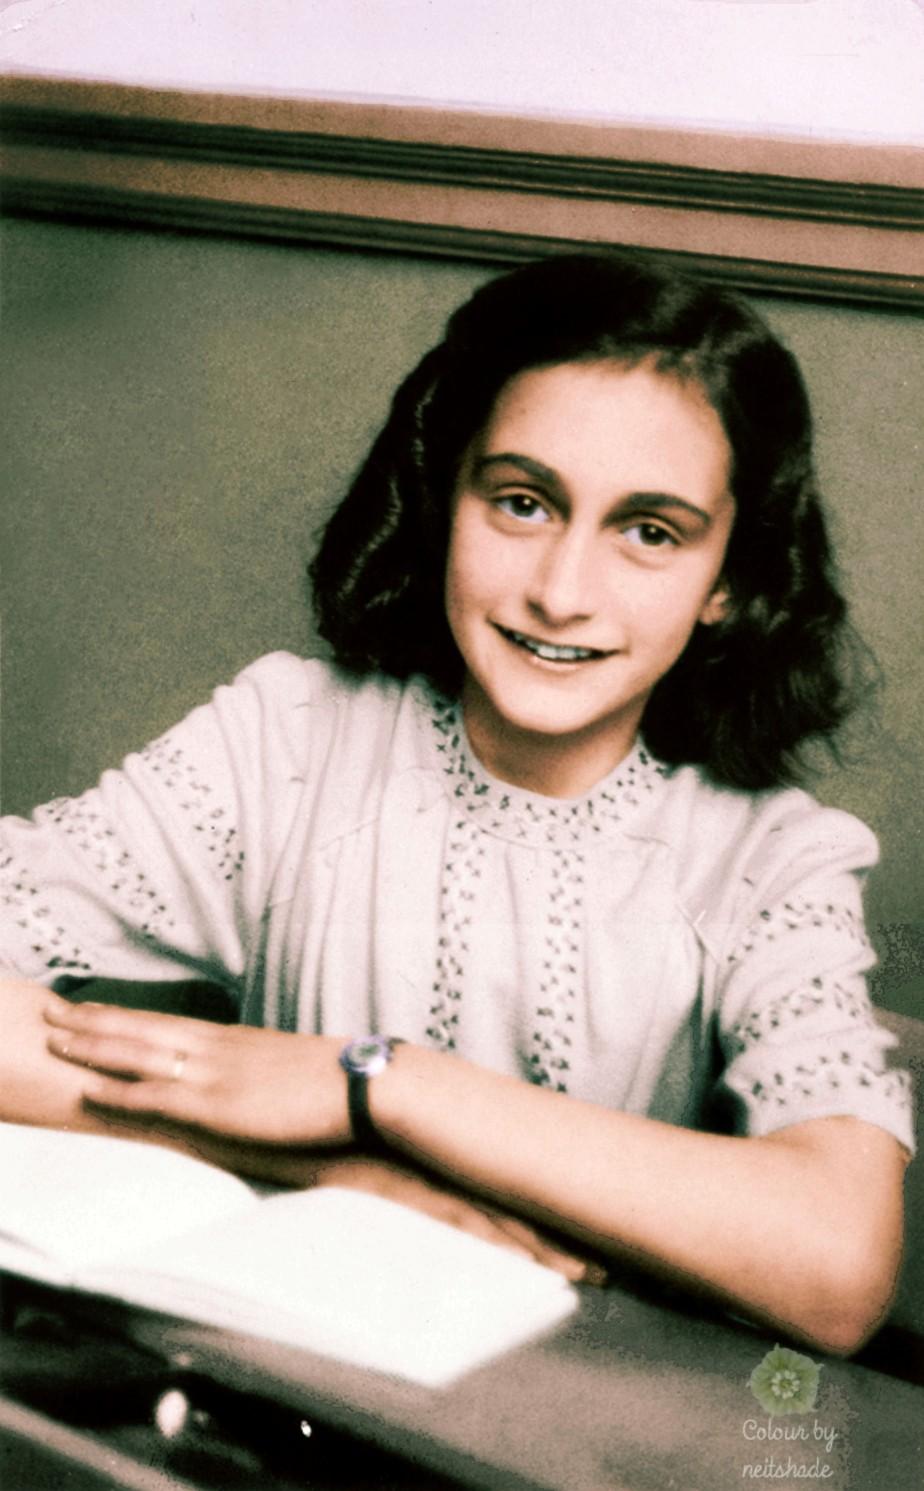 Anne Frank school photo1941